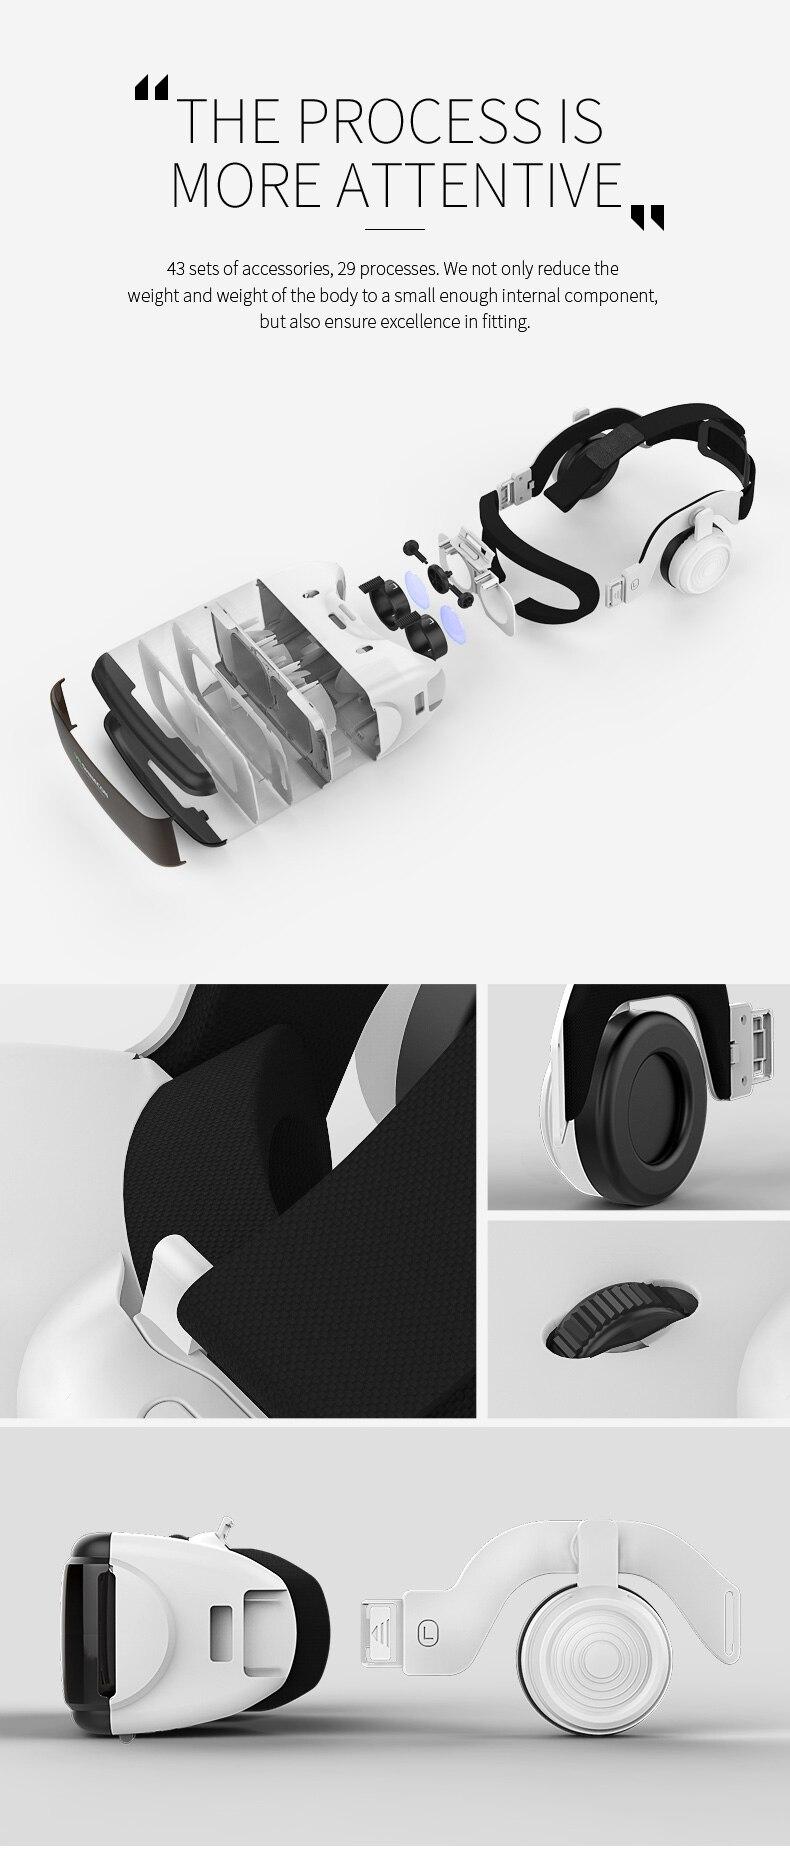 VR SHINECON BOX 5 Mini VR Glasses 3D G 06E Glasses Virtual Reality Glasses VR Headset For Google cardboard with headphone